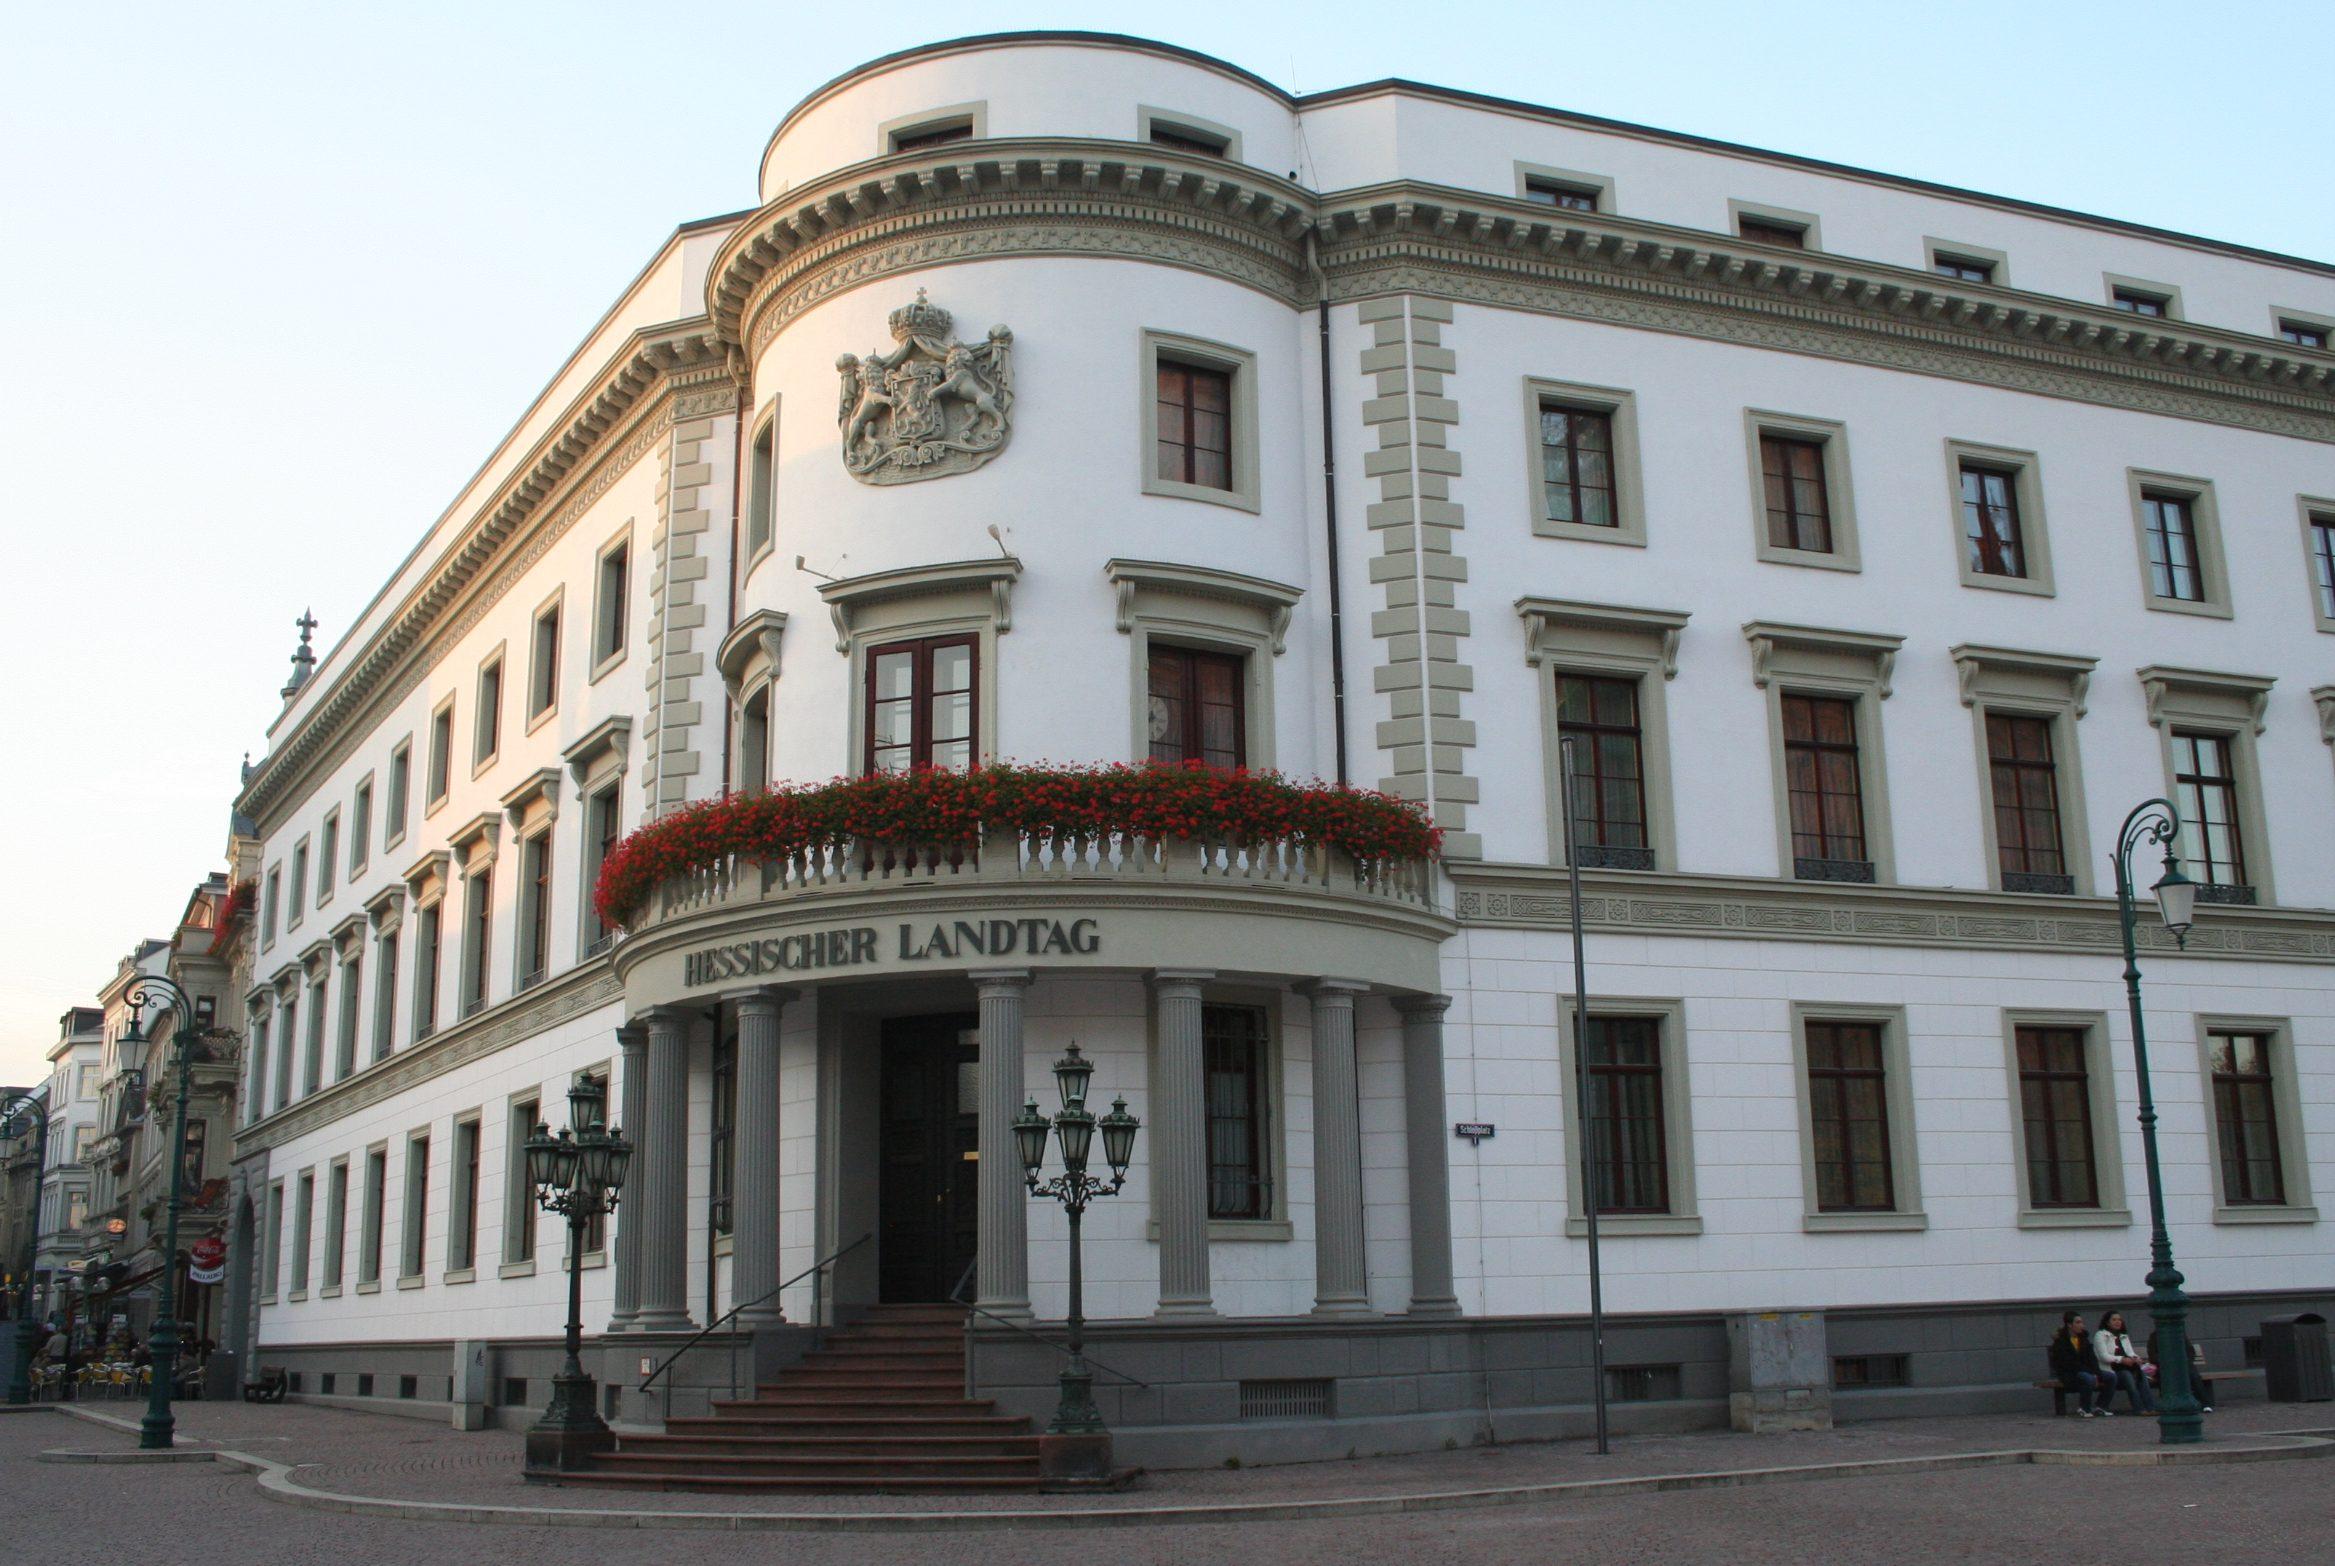 Bb Wiesbaden file hessischer landtag in wiesbaden jpg wikimedia commons